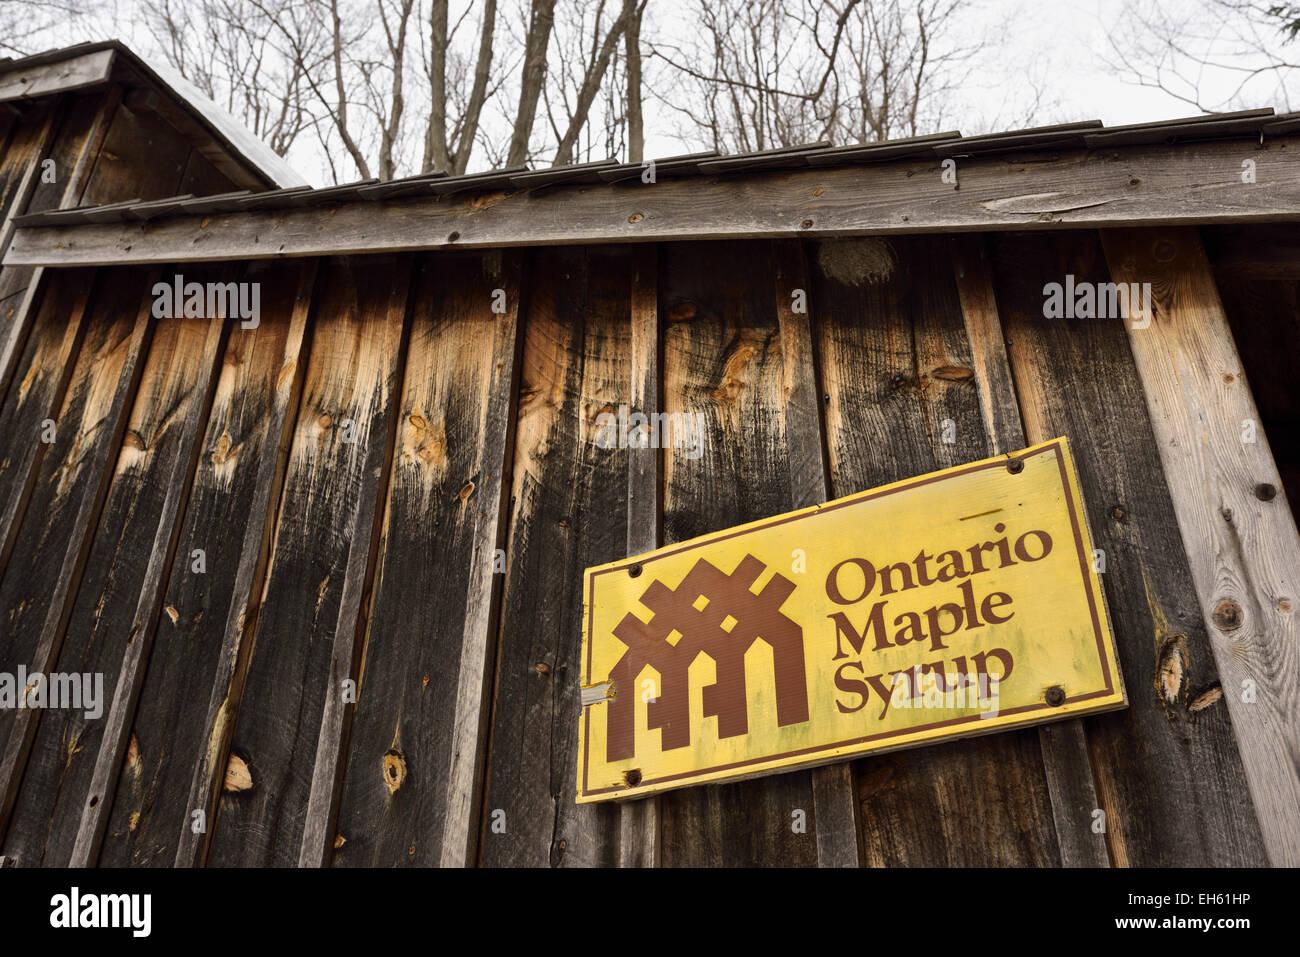 Cabaña de azúcar con la asociación de productores de jarabe de arce de Ontario logo Imagen De Stock